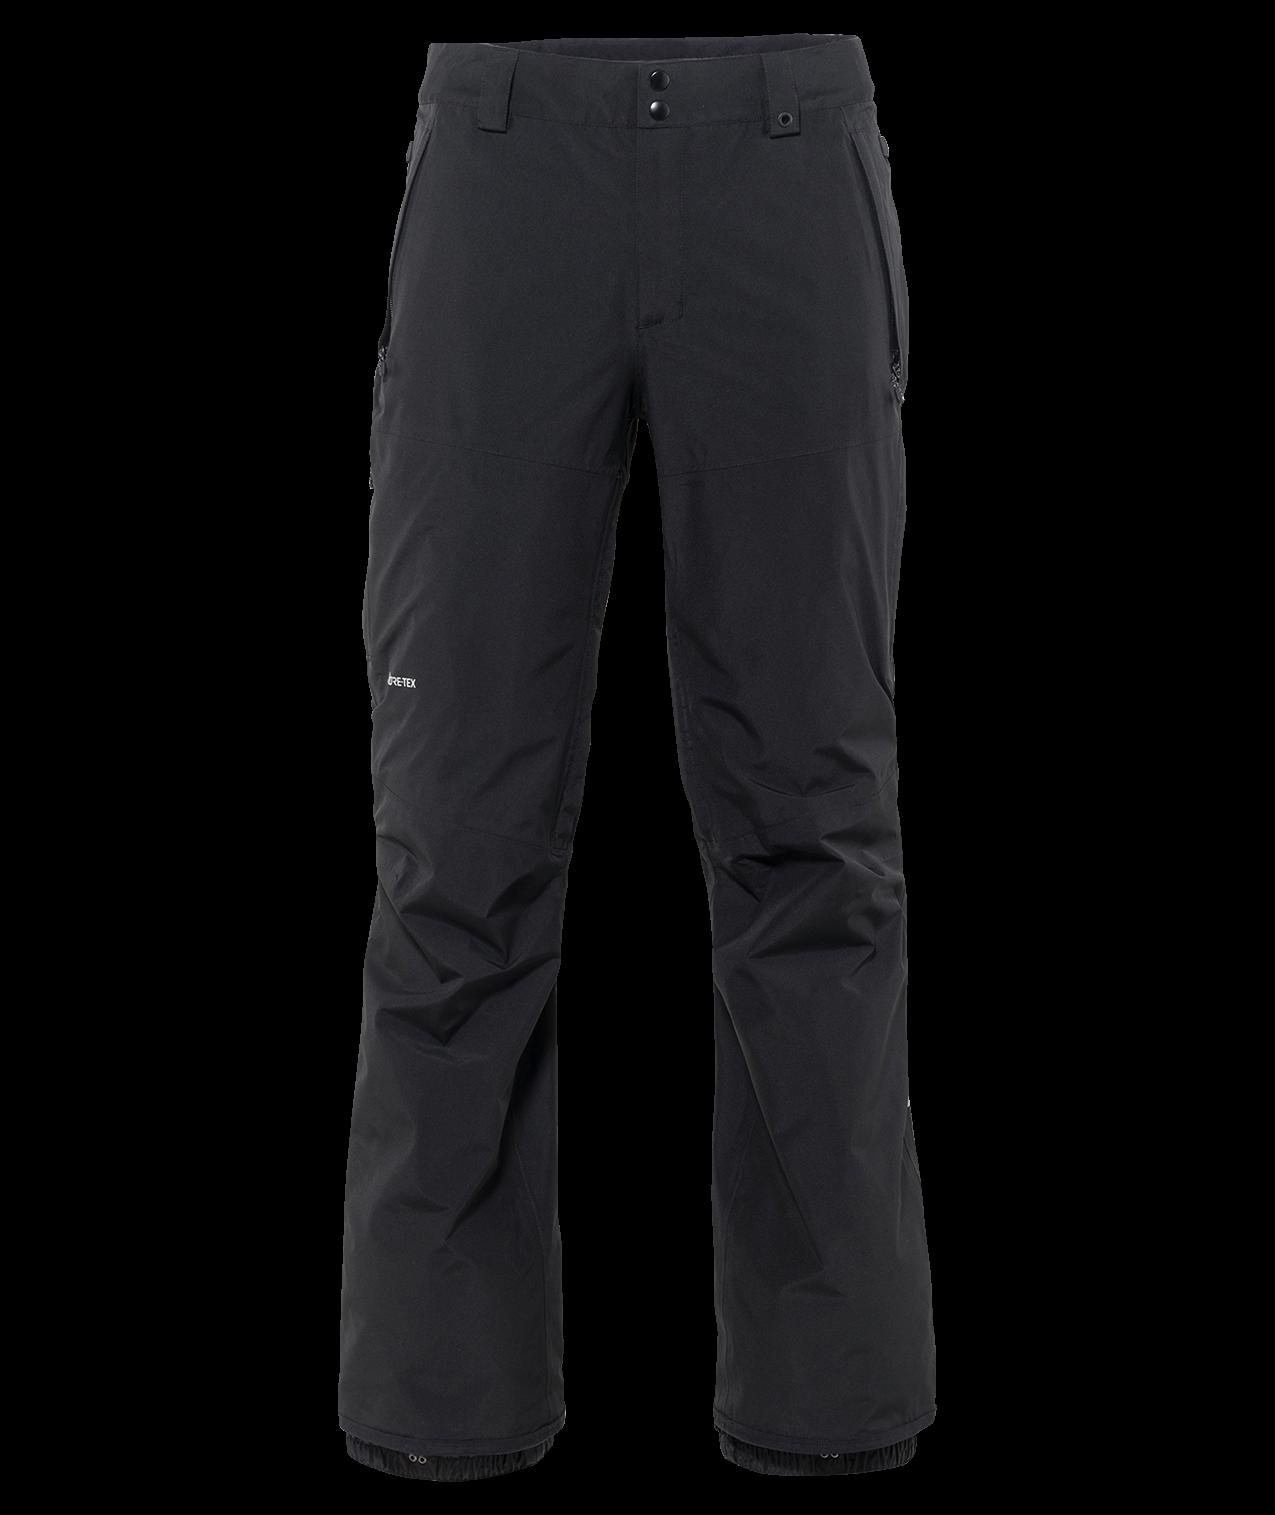 686 Men's GLCR Gore-Tex Core Shell Pant - Black